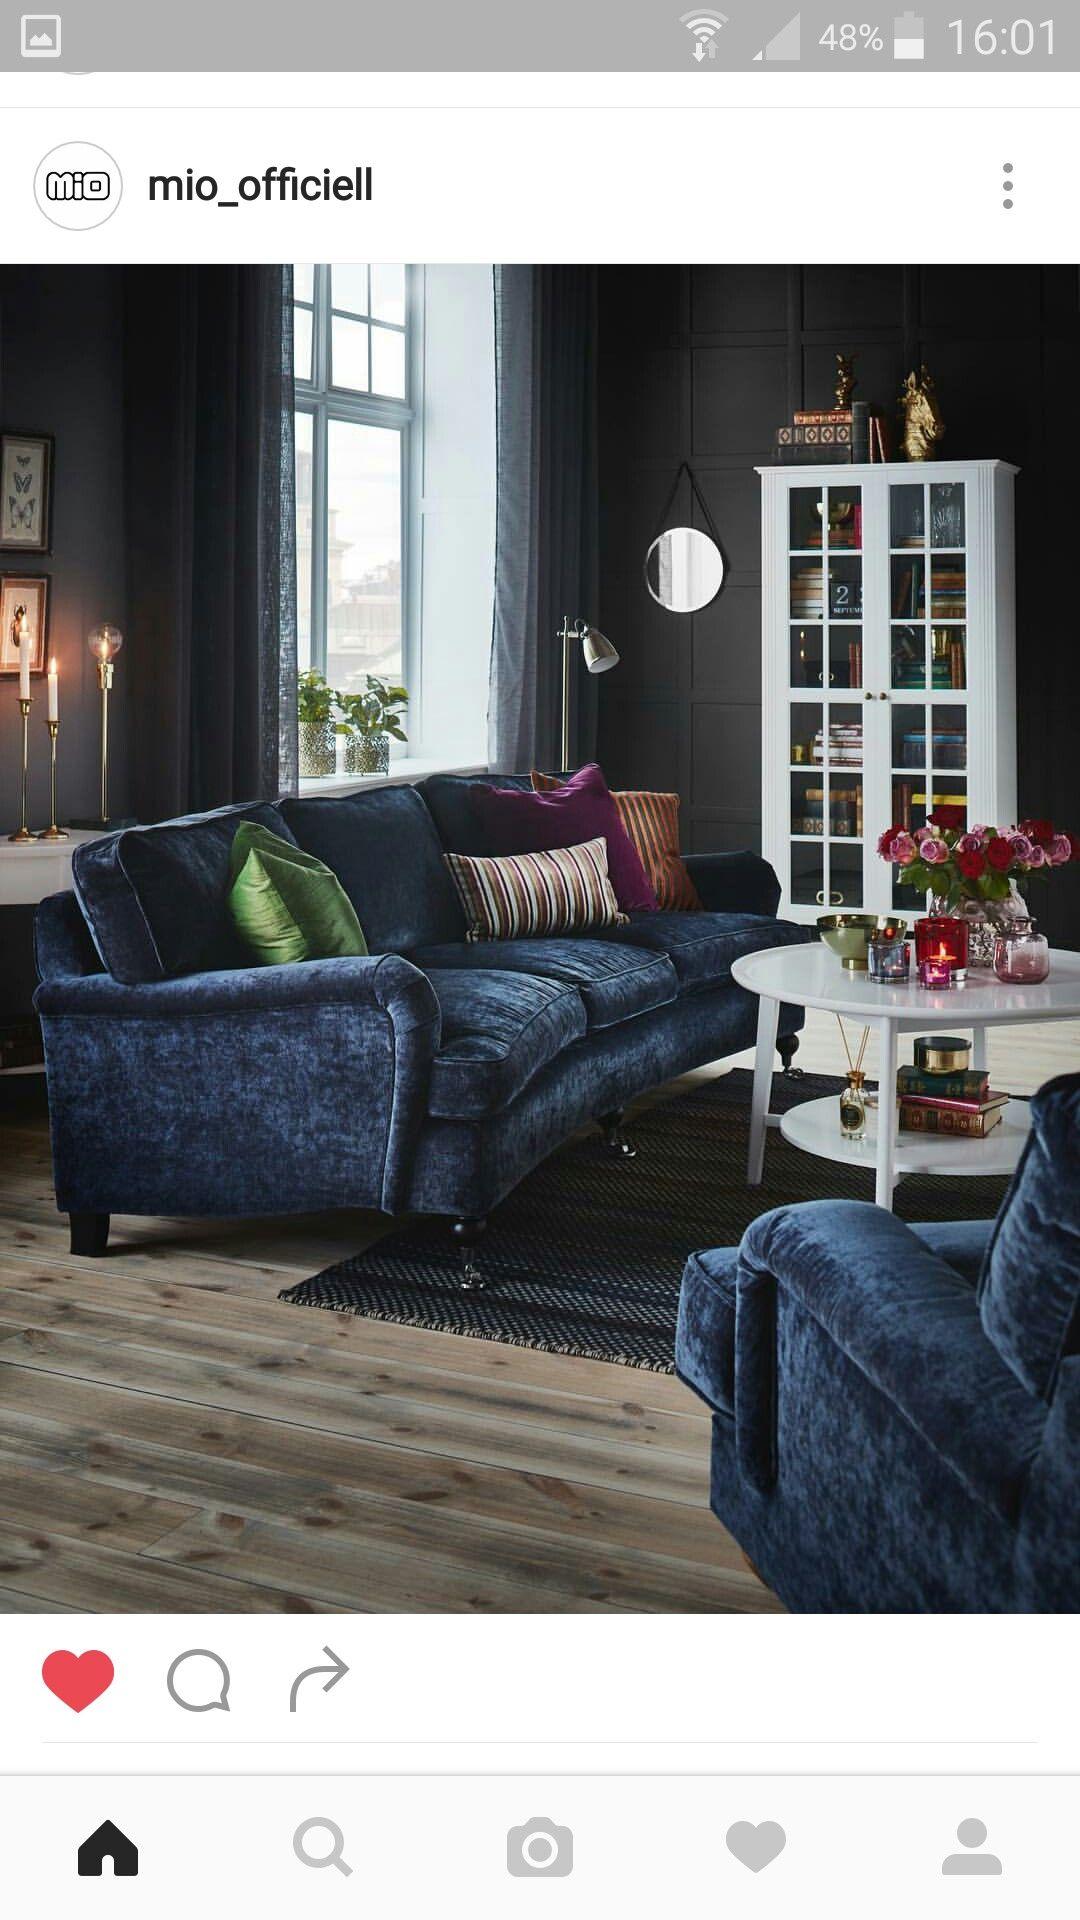 soffa blå mio vardagsrum Interior indoor in 2019 Soffa vardagsrum inspiration, Vardagsrum